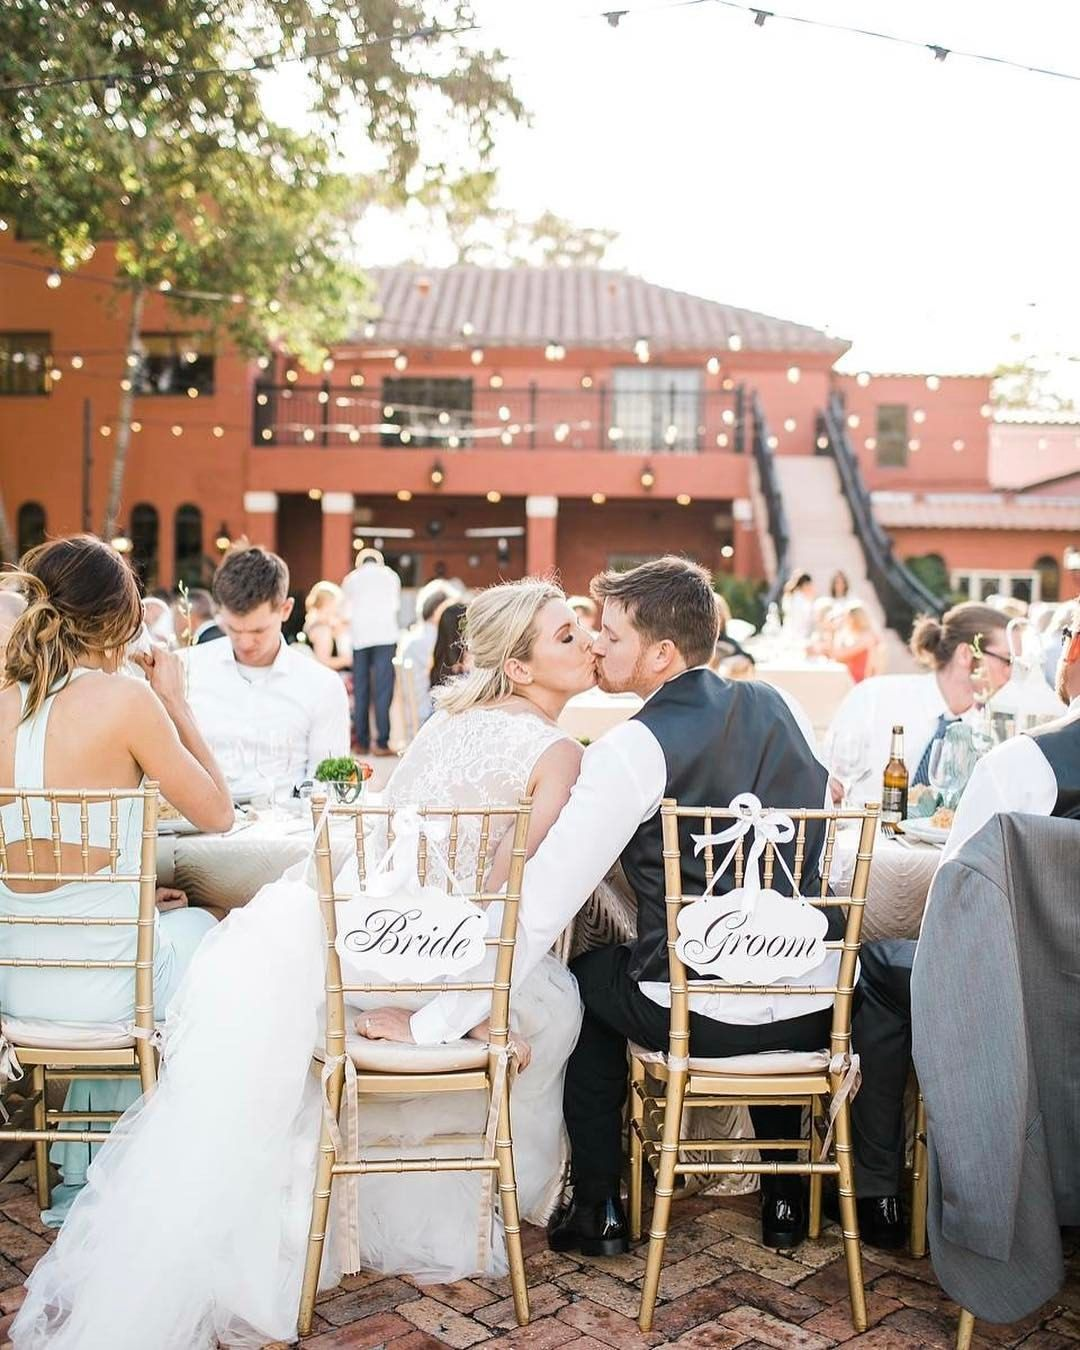 South Florida Weddings. Florida Wedding Planner. Wedding Blog Miami. Bodas  Florida. Backyard Wedding. Tropical Wedding.